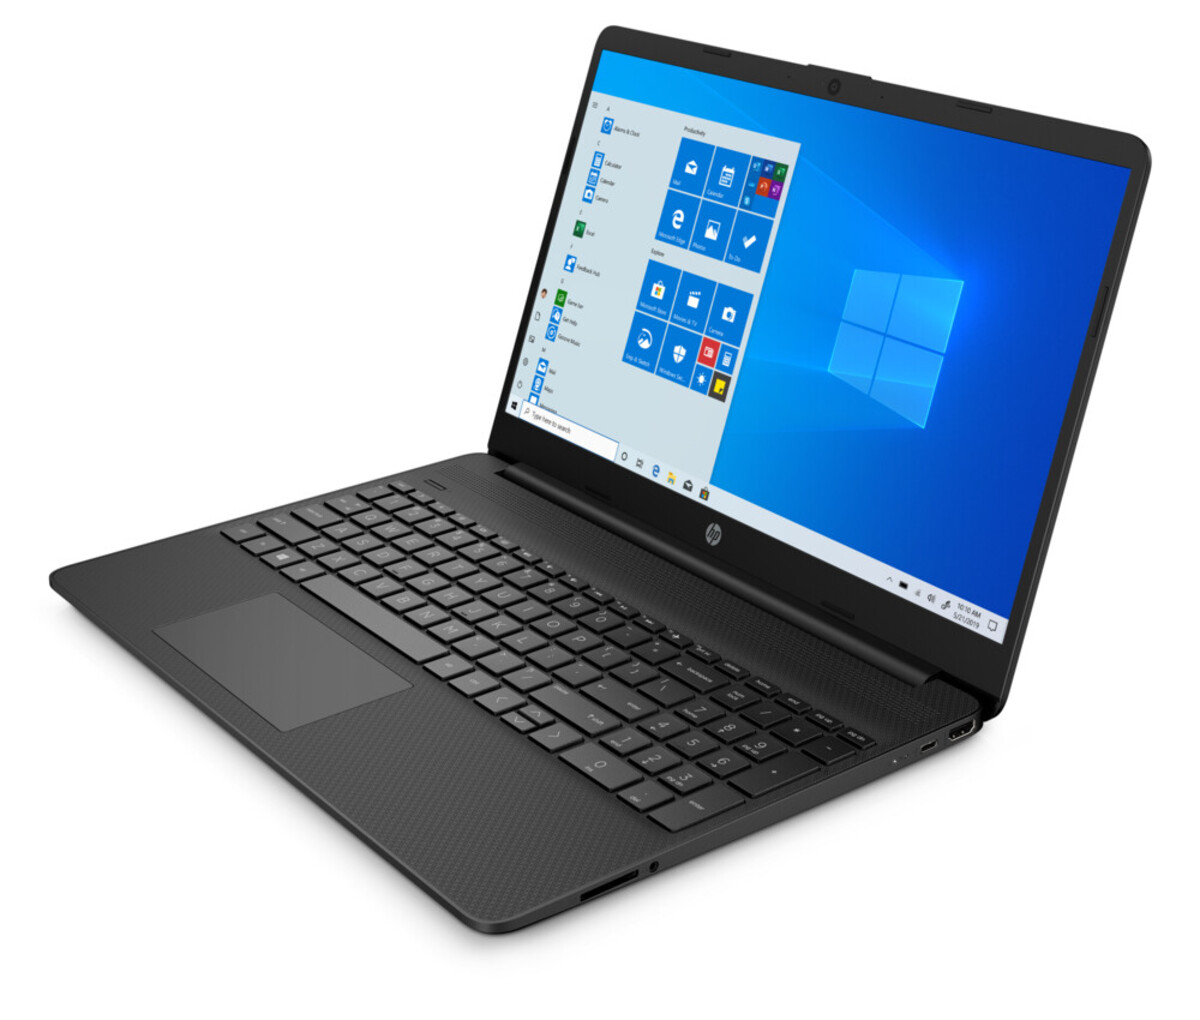 Bild 3 von HP 15s-eq2632ng schwarz Notebook (15,6 Zoll Full-HD (matt), Ryzen 5 5500U, 8 GB RAM, 512 GB SSD, AMD Radeon, Windows 10 Home)